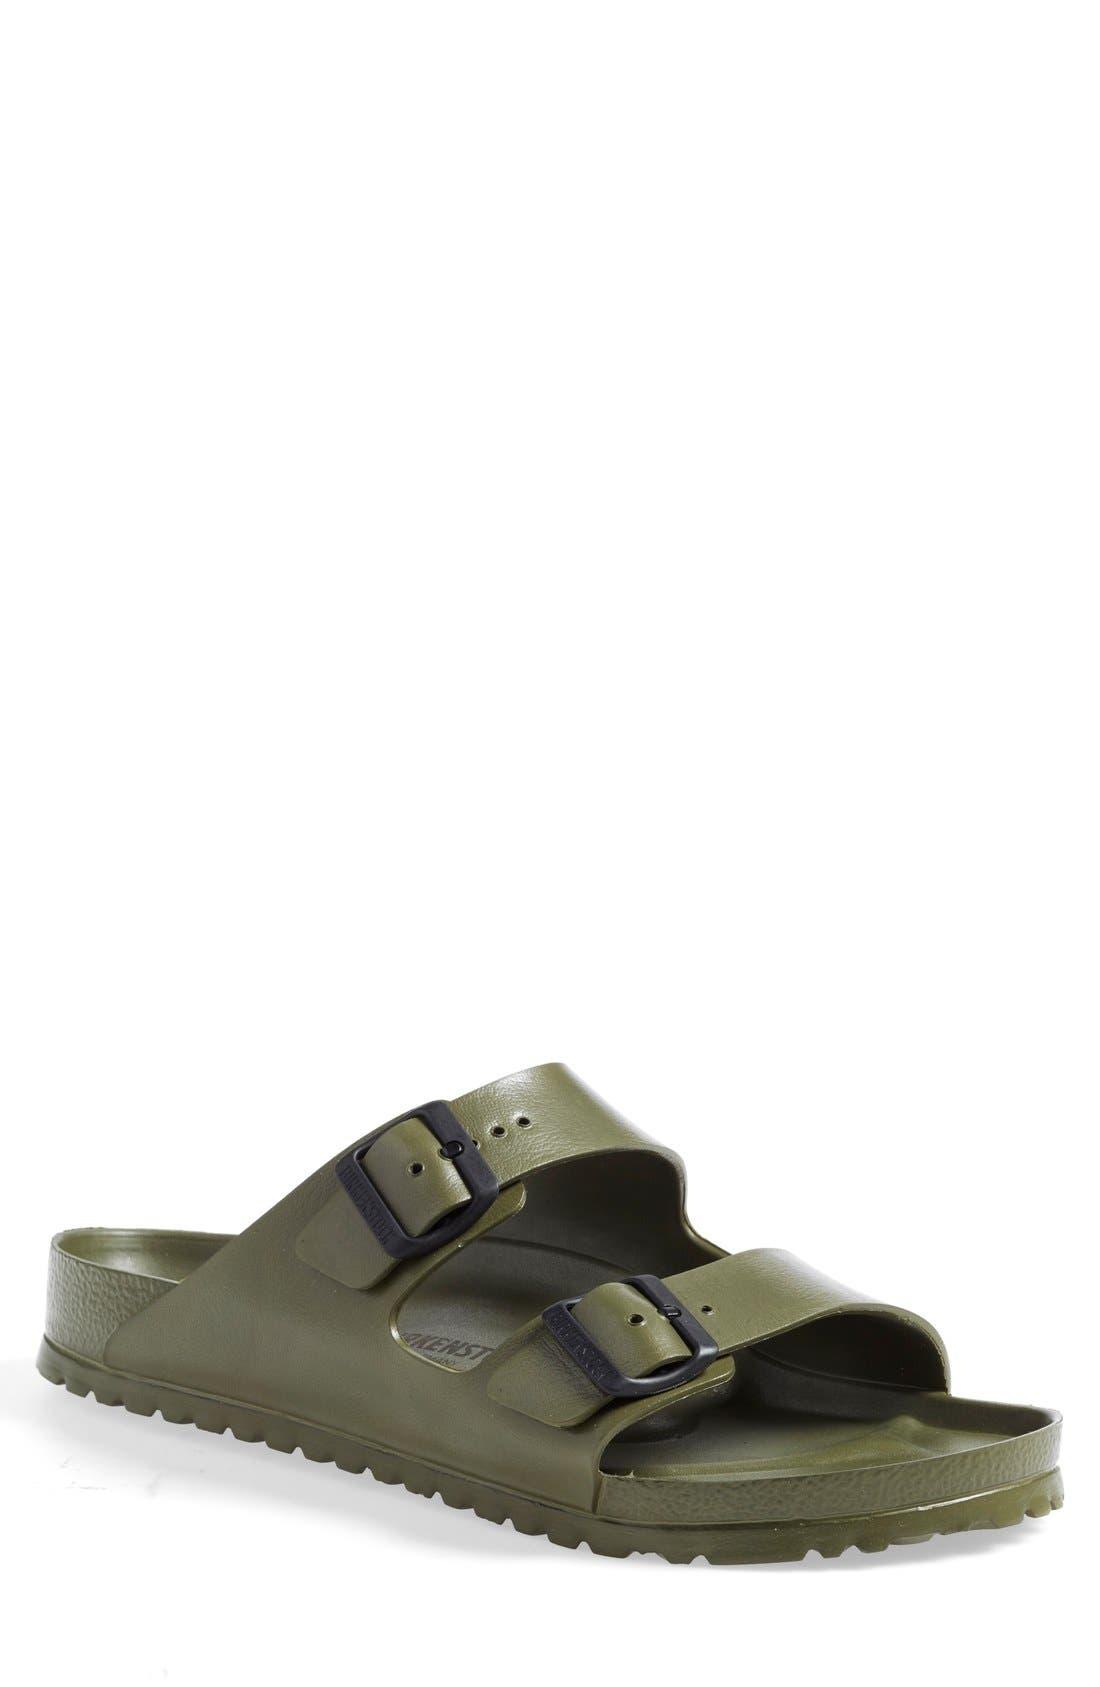 weahWyfnwu Mens Essentials - Arizona Eva Waterproof Slide Sandal ZV4oJNwYJZ